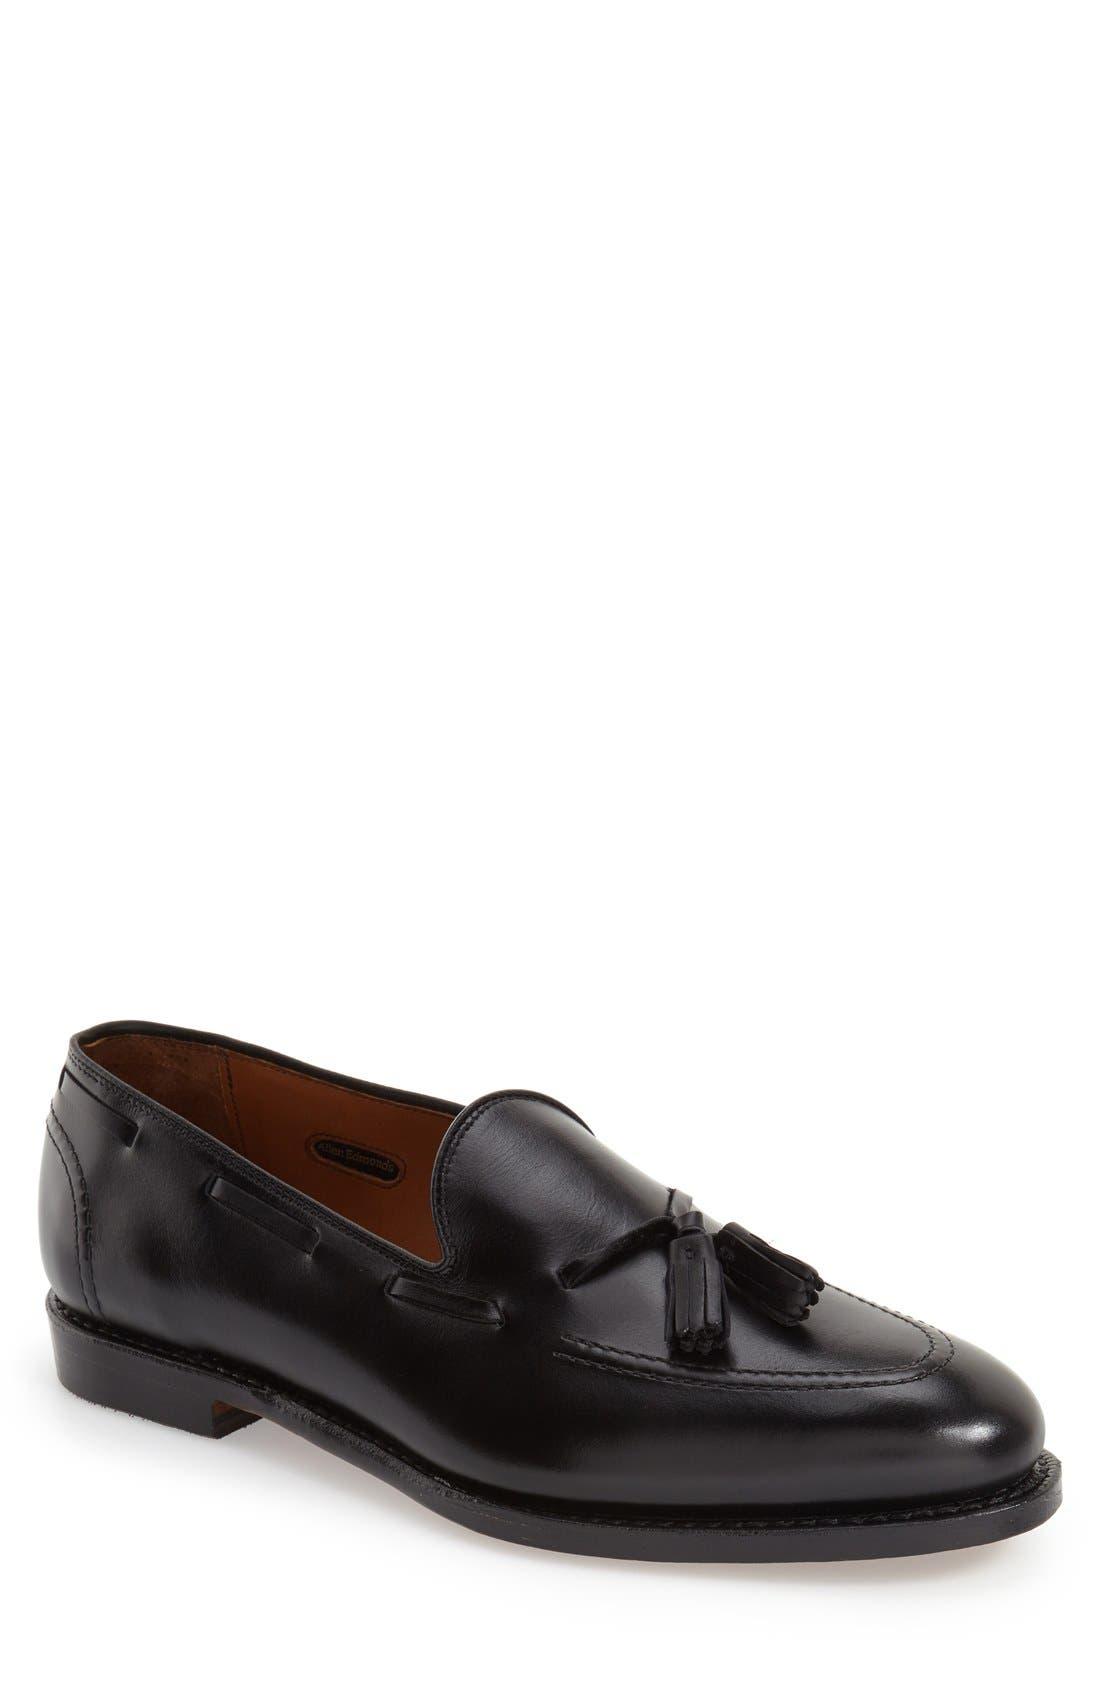 'Acheson' Tassel Loafer,                         Main,                         color, BLACK